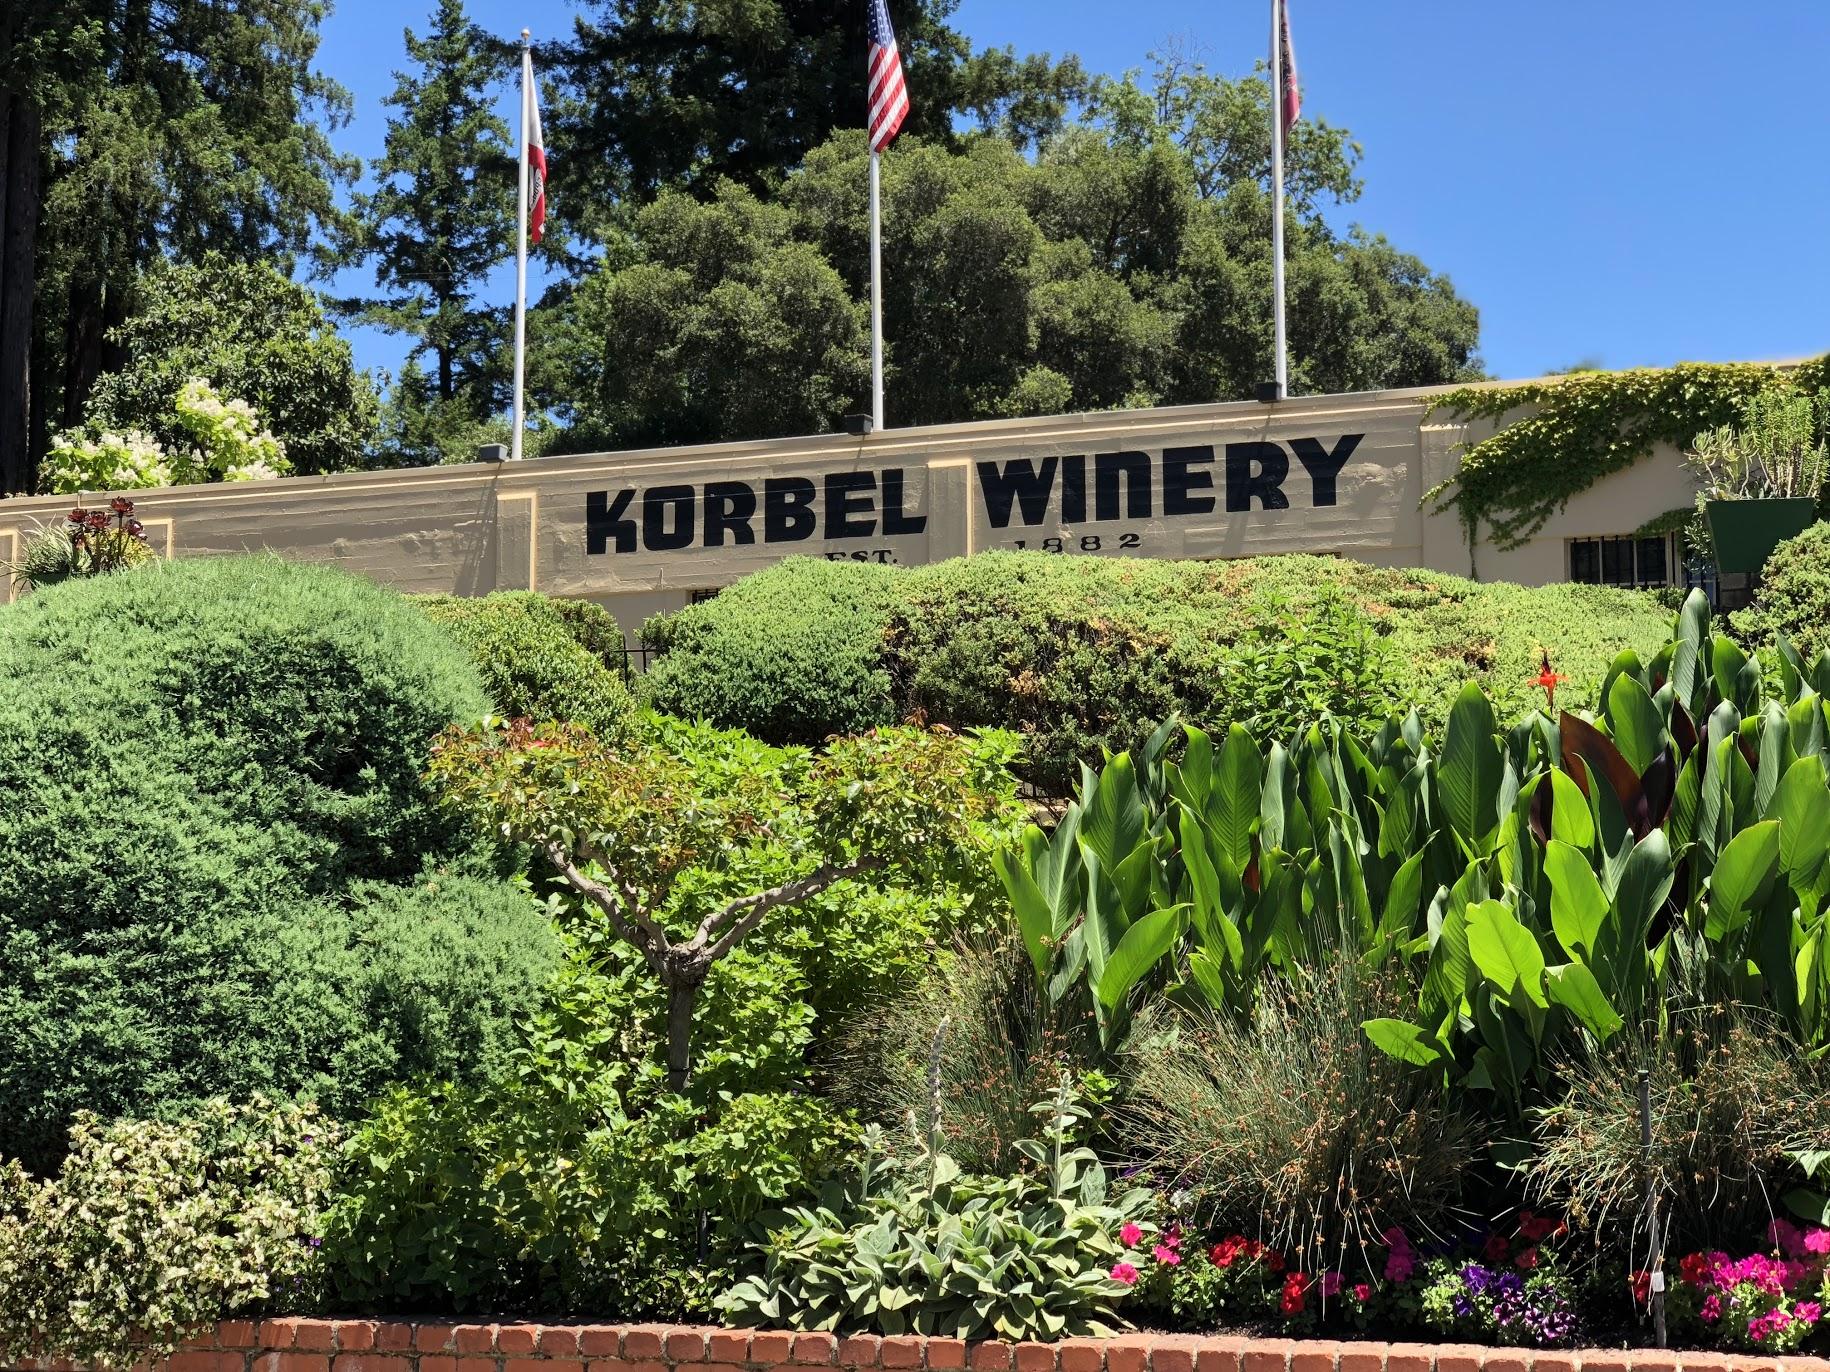 Korbel Winery